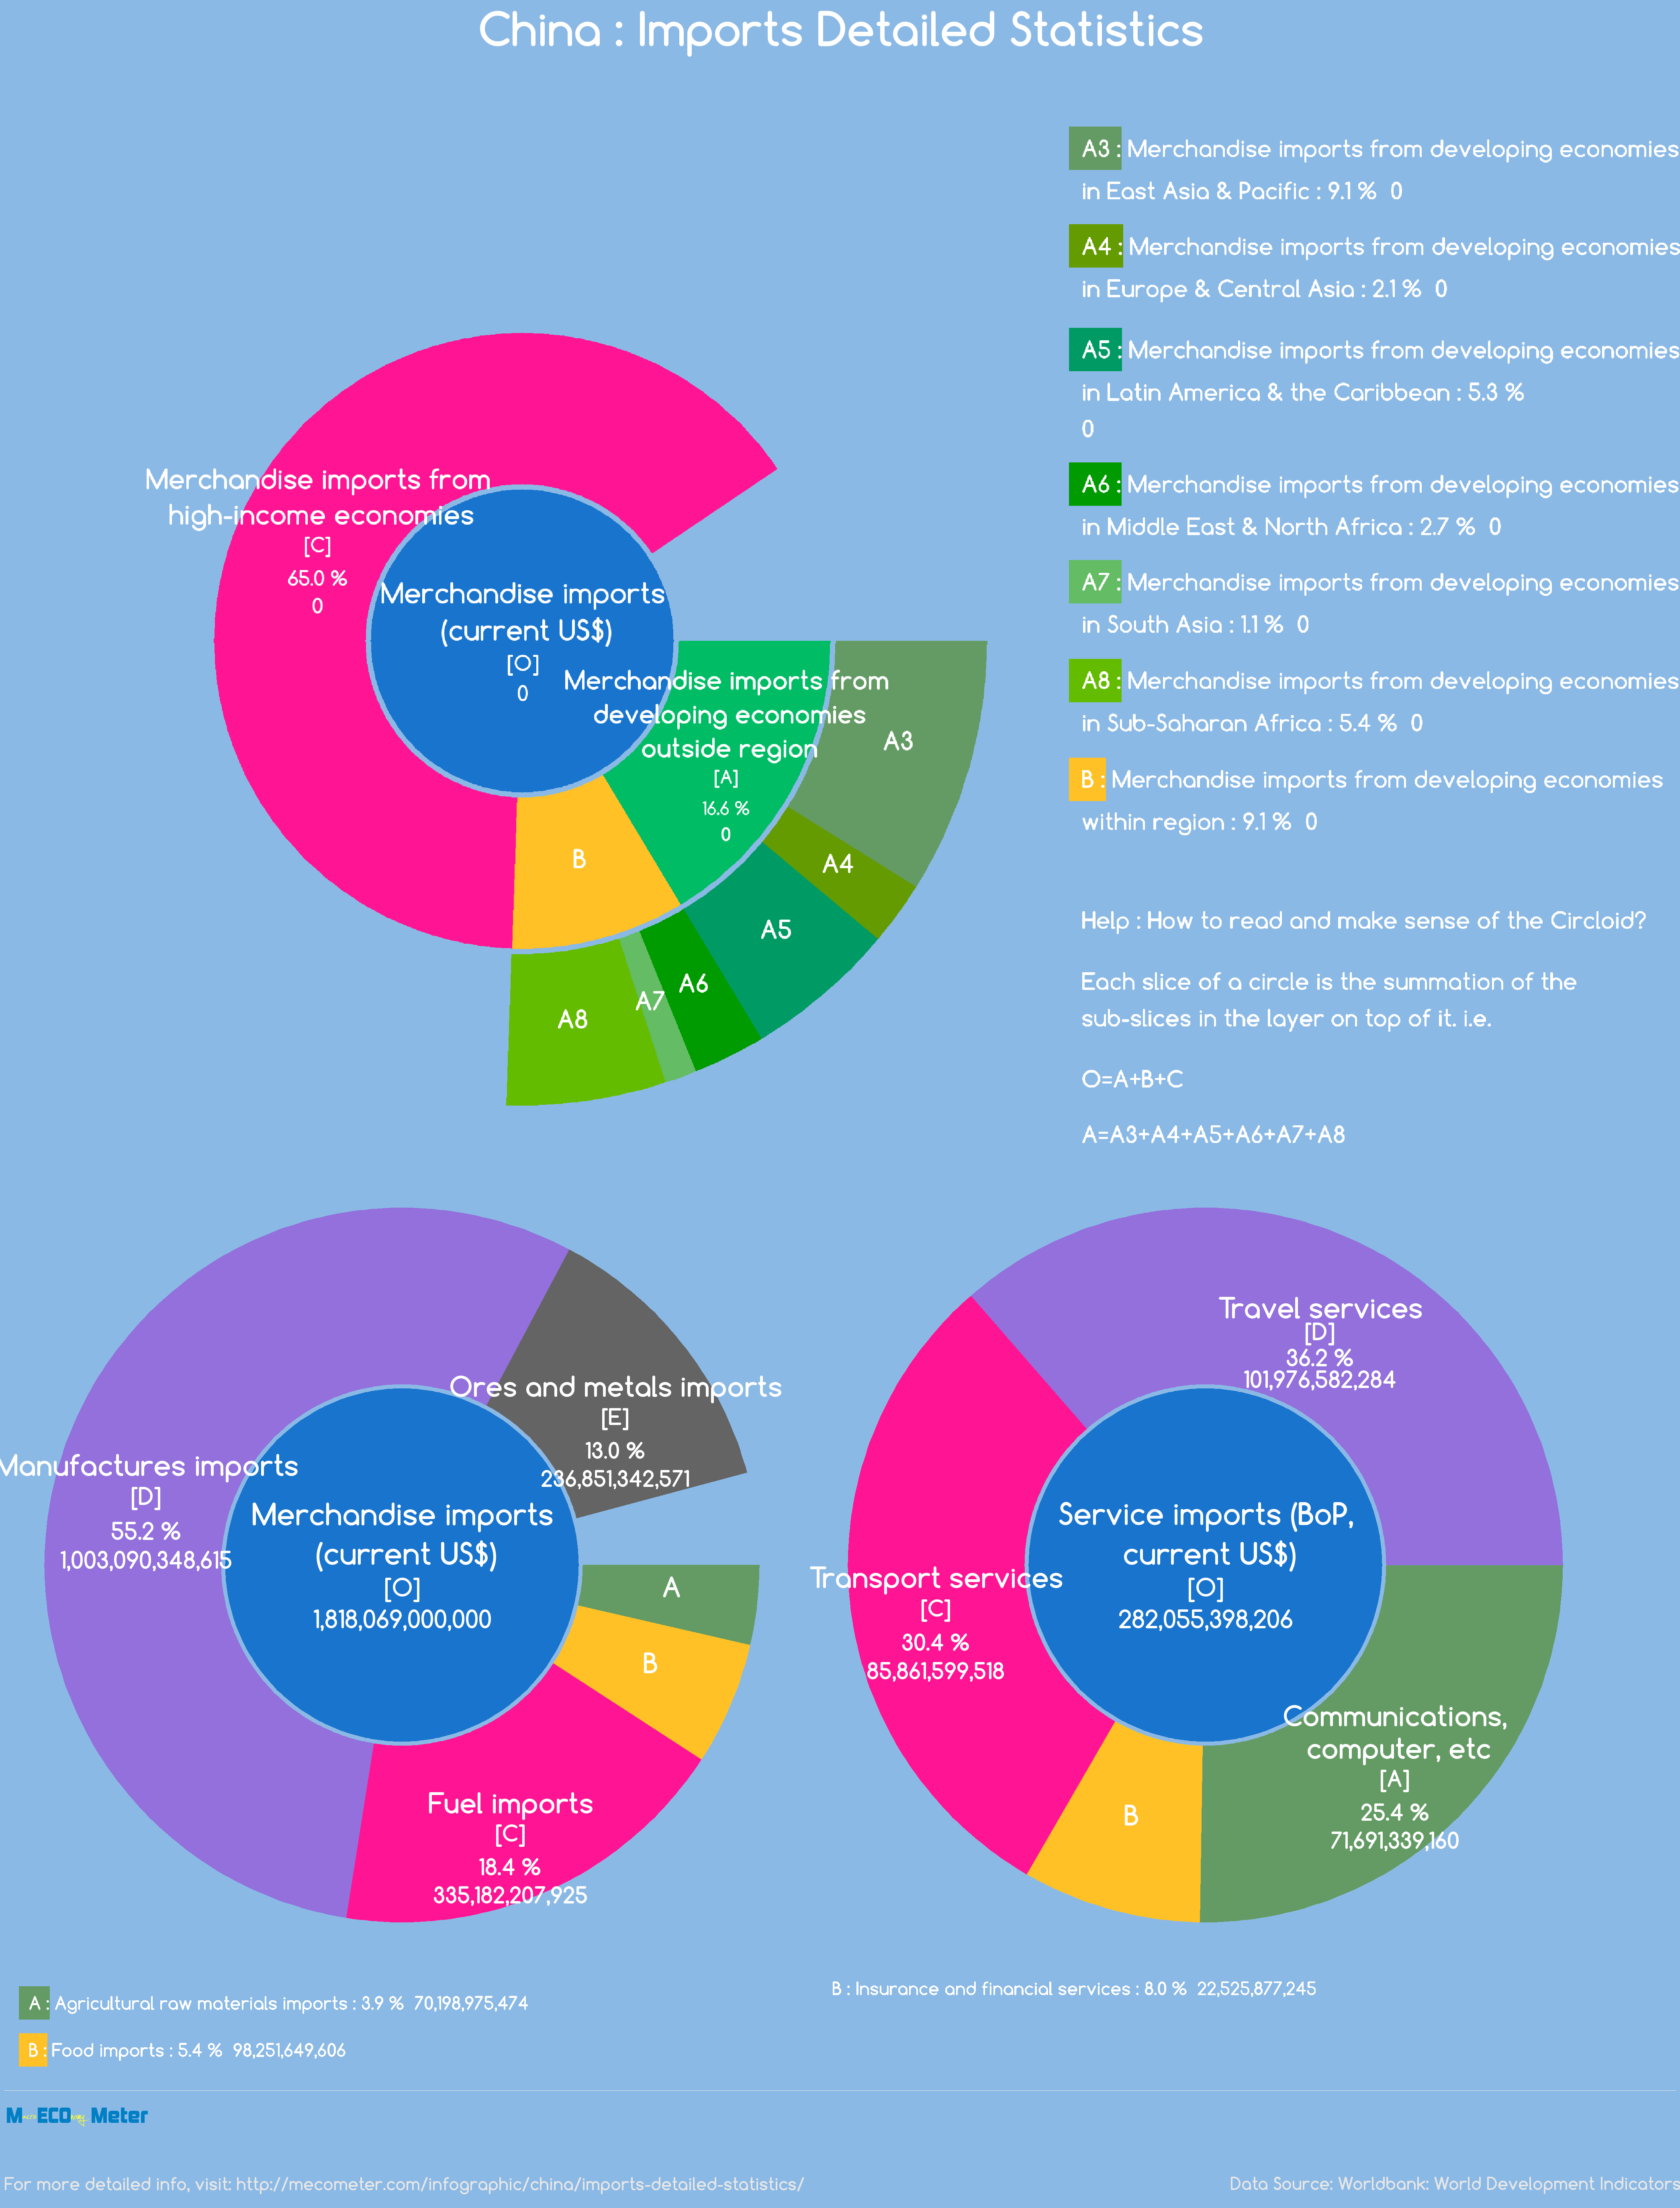 China : Imports Detailed Statistics